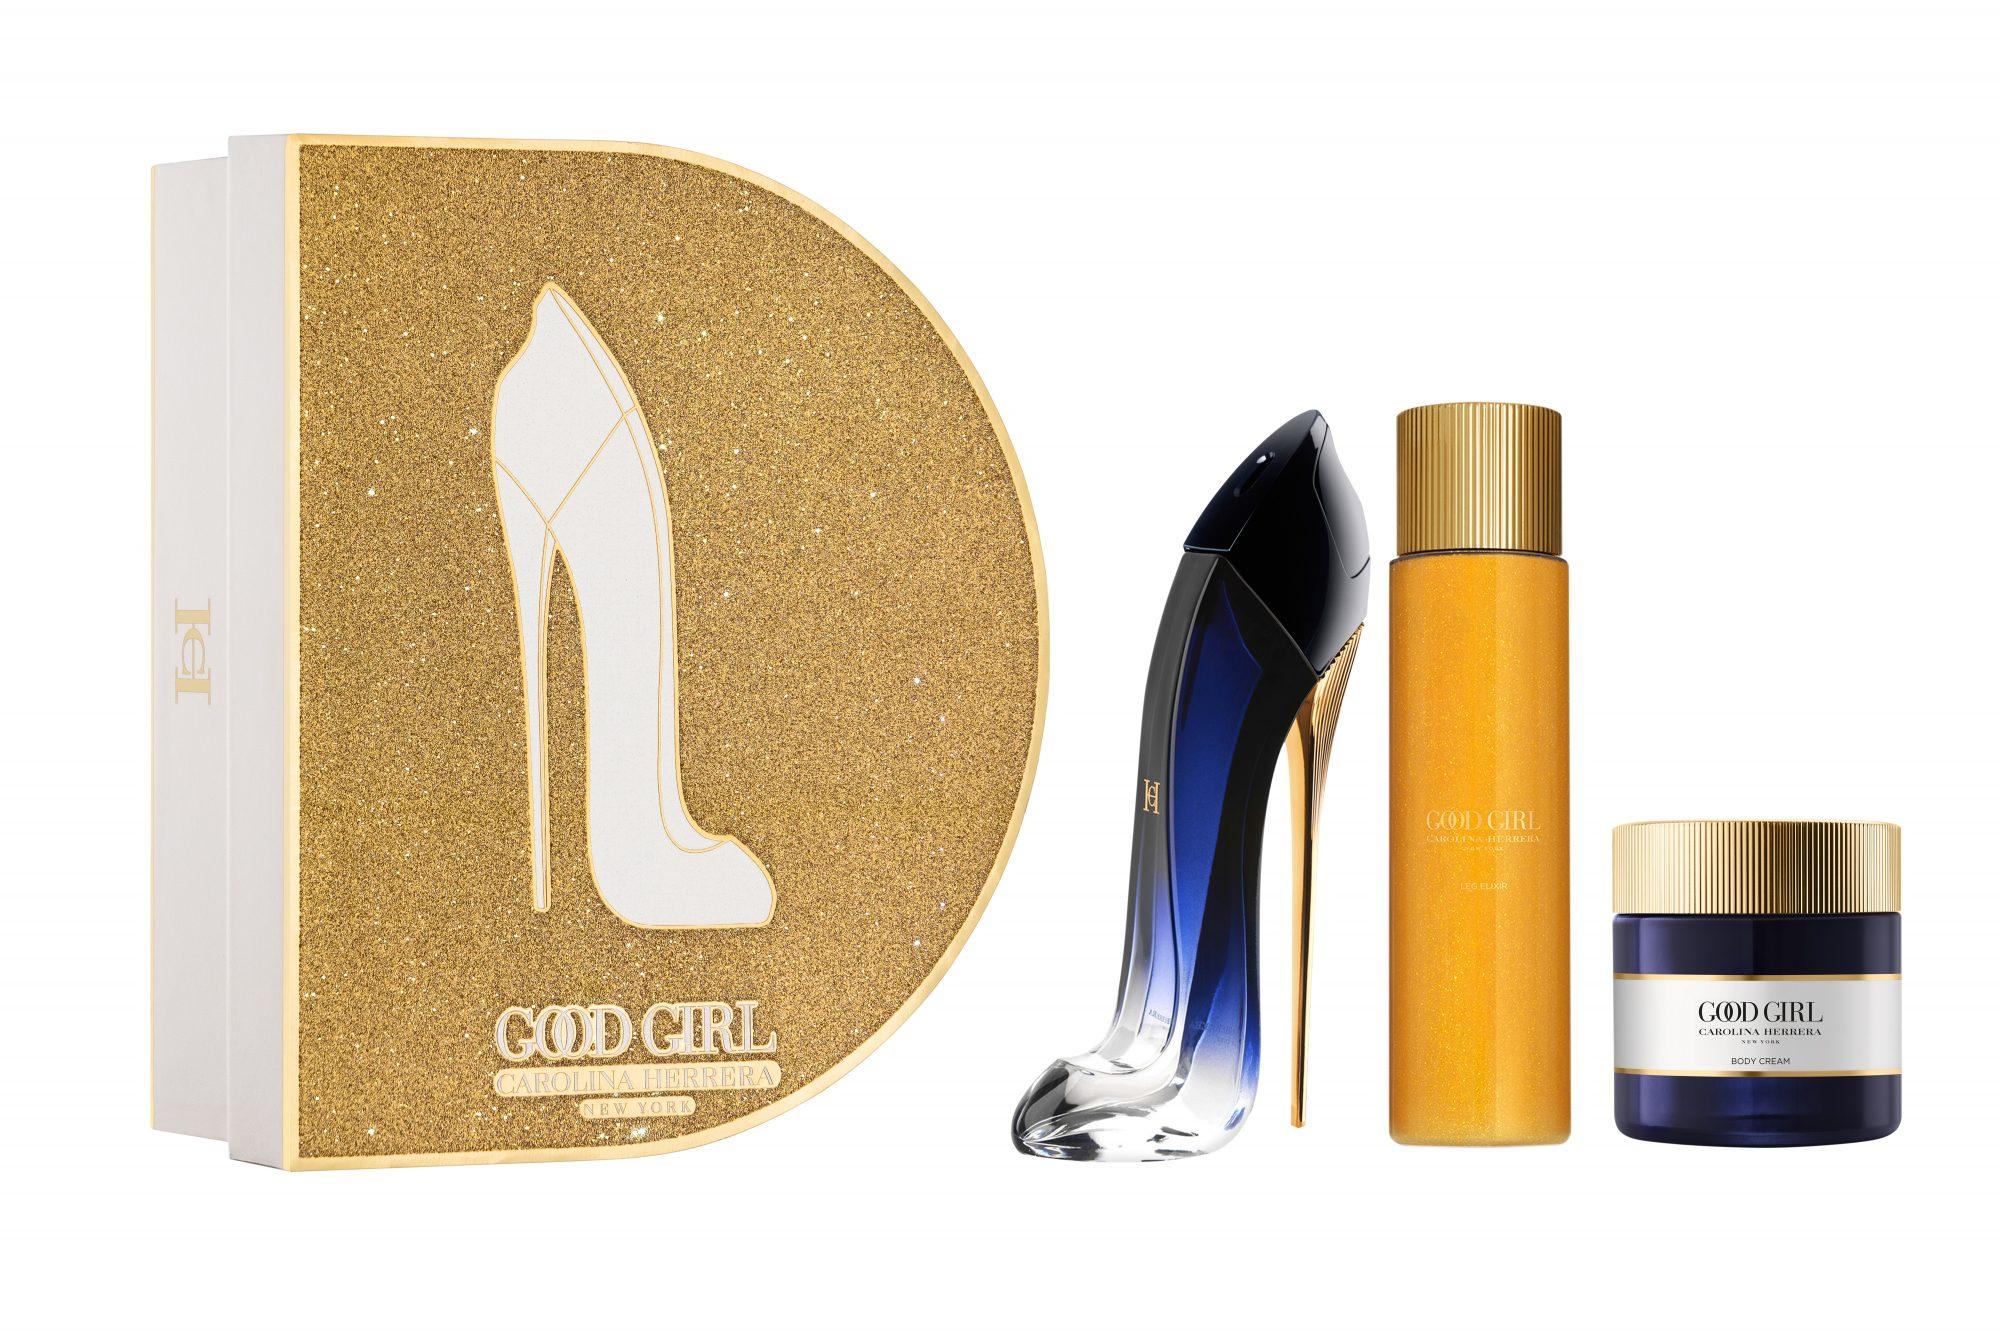 Carolina Herrera perfume Good Girl